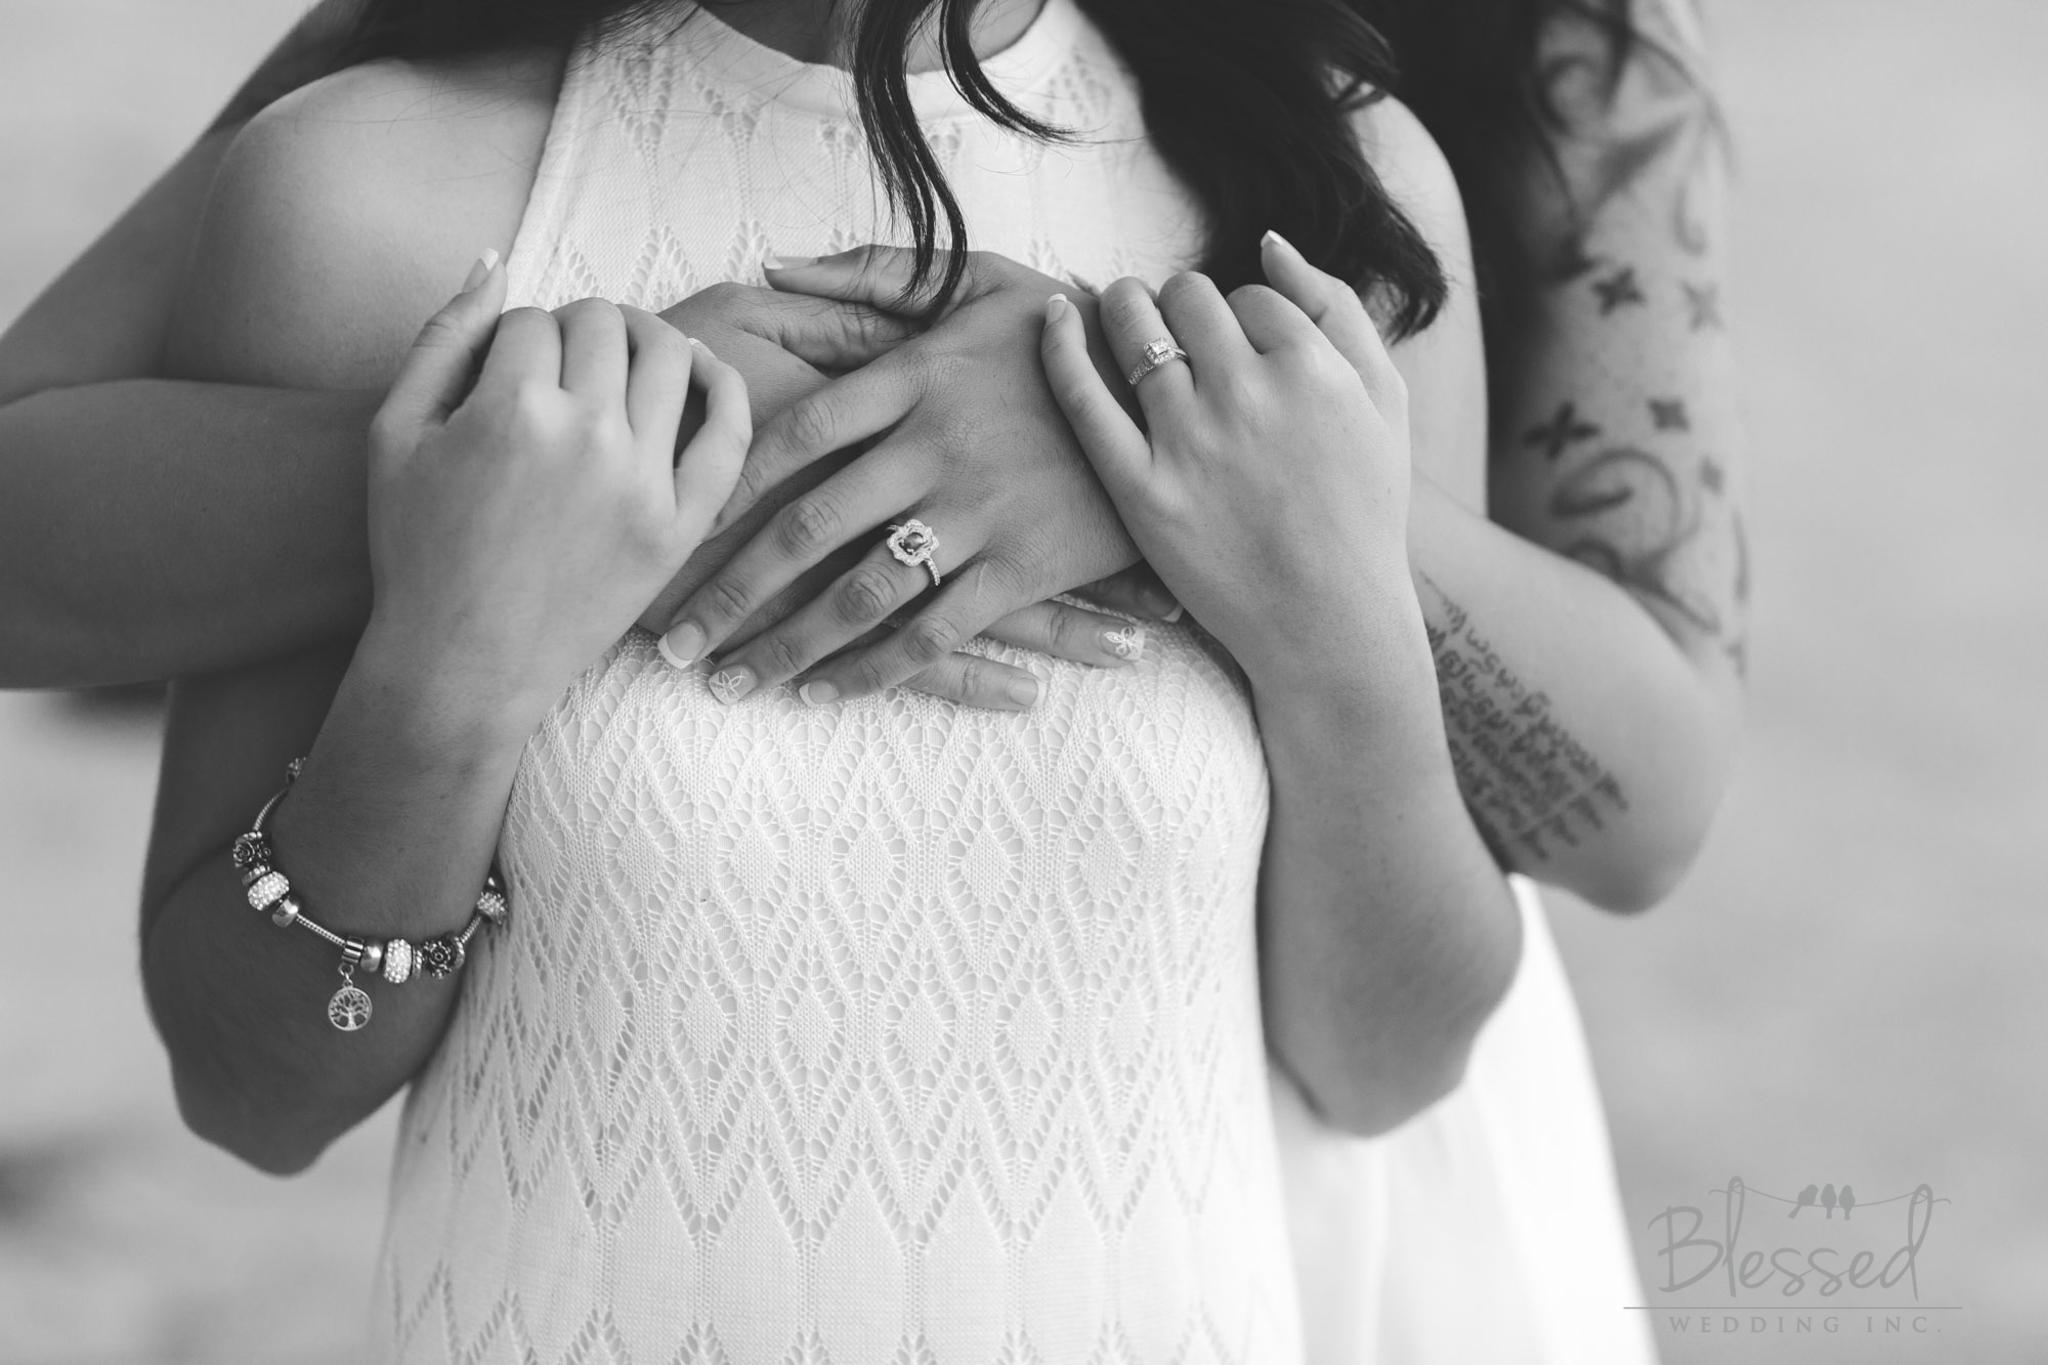 La Jolla Beach Engagement Session by San Diego Wedding Photographers Blessed Wedding-56.jpg